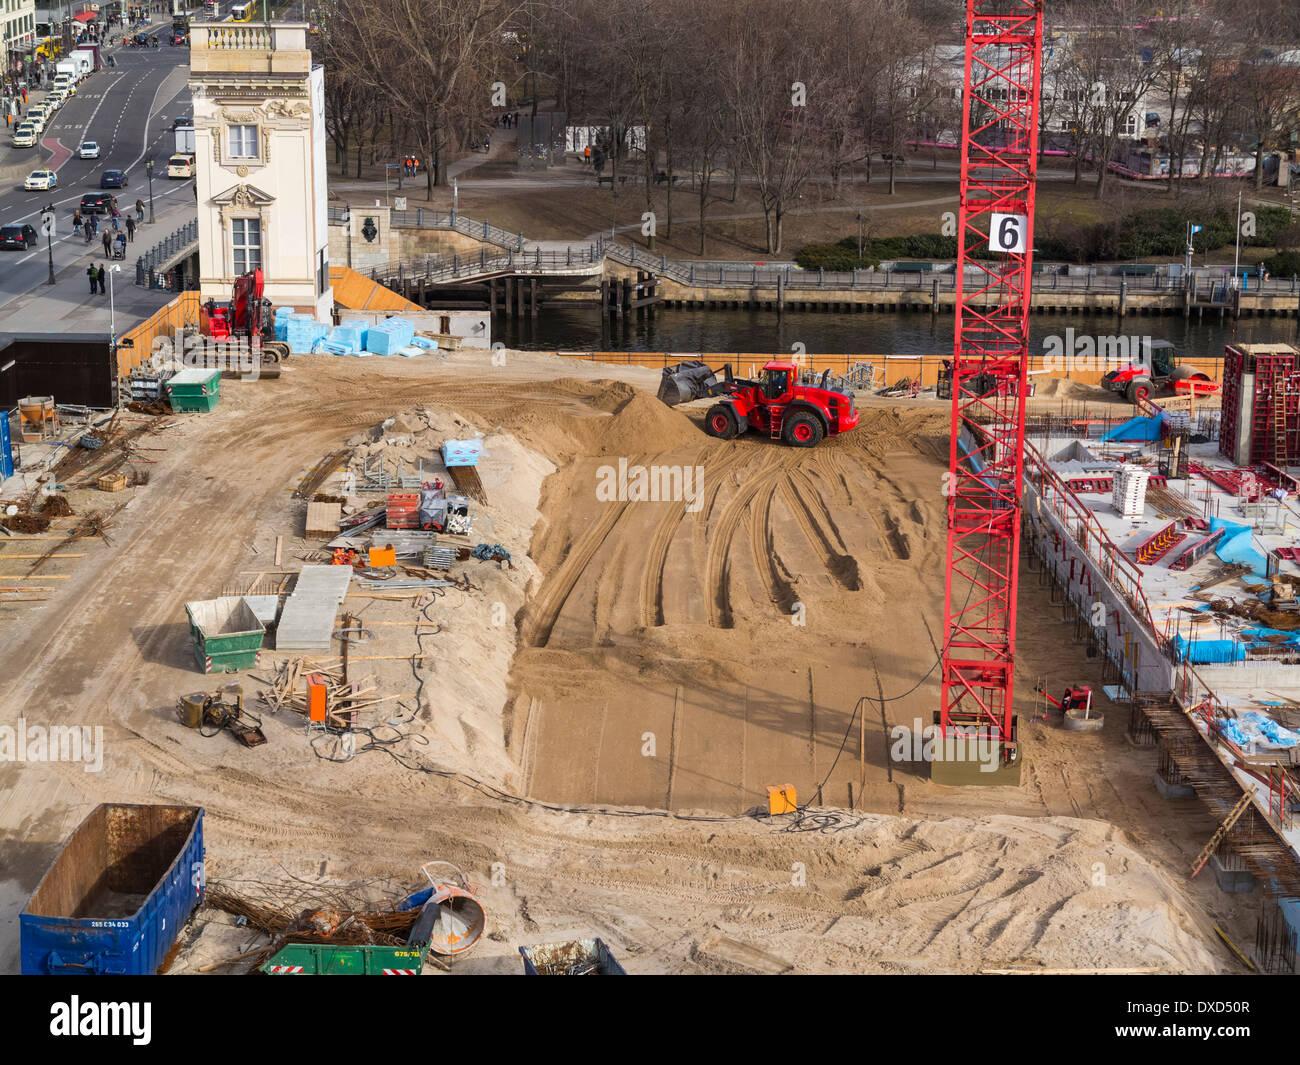 Baustelle im Stadtzentrum Stockbild